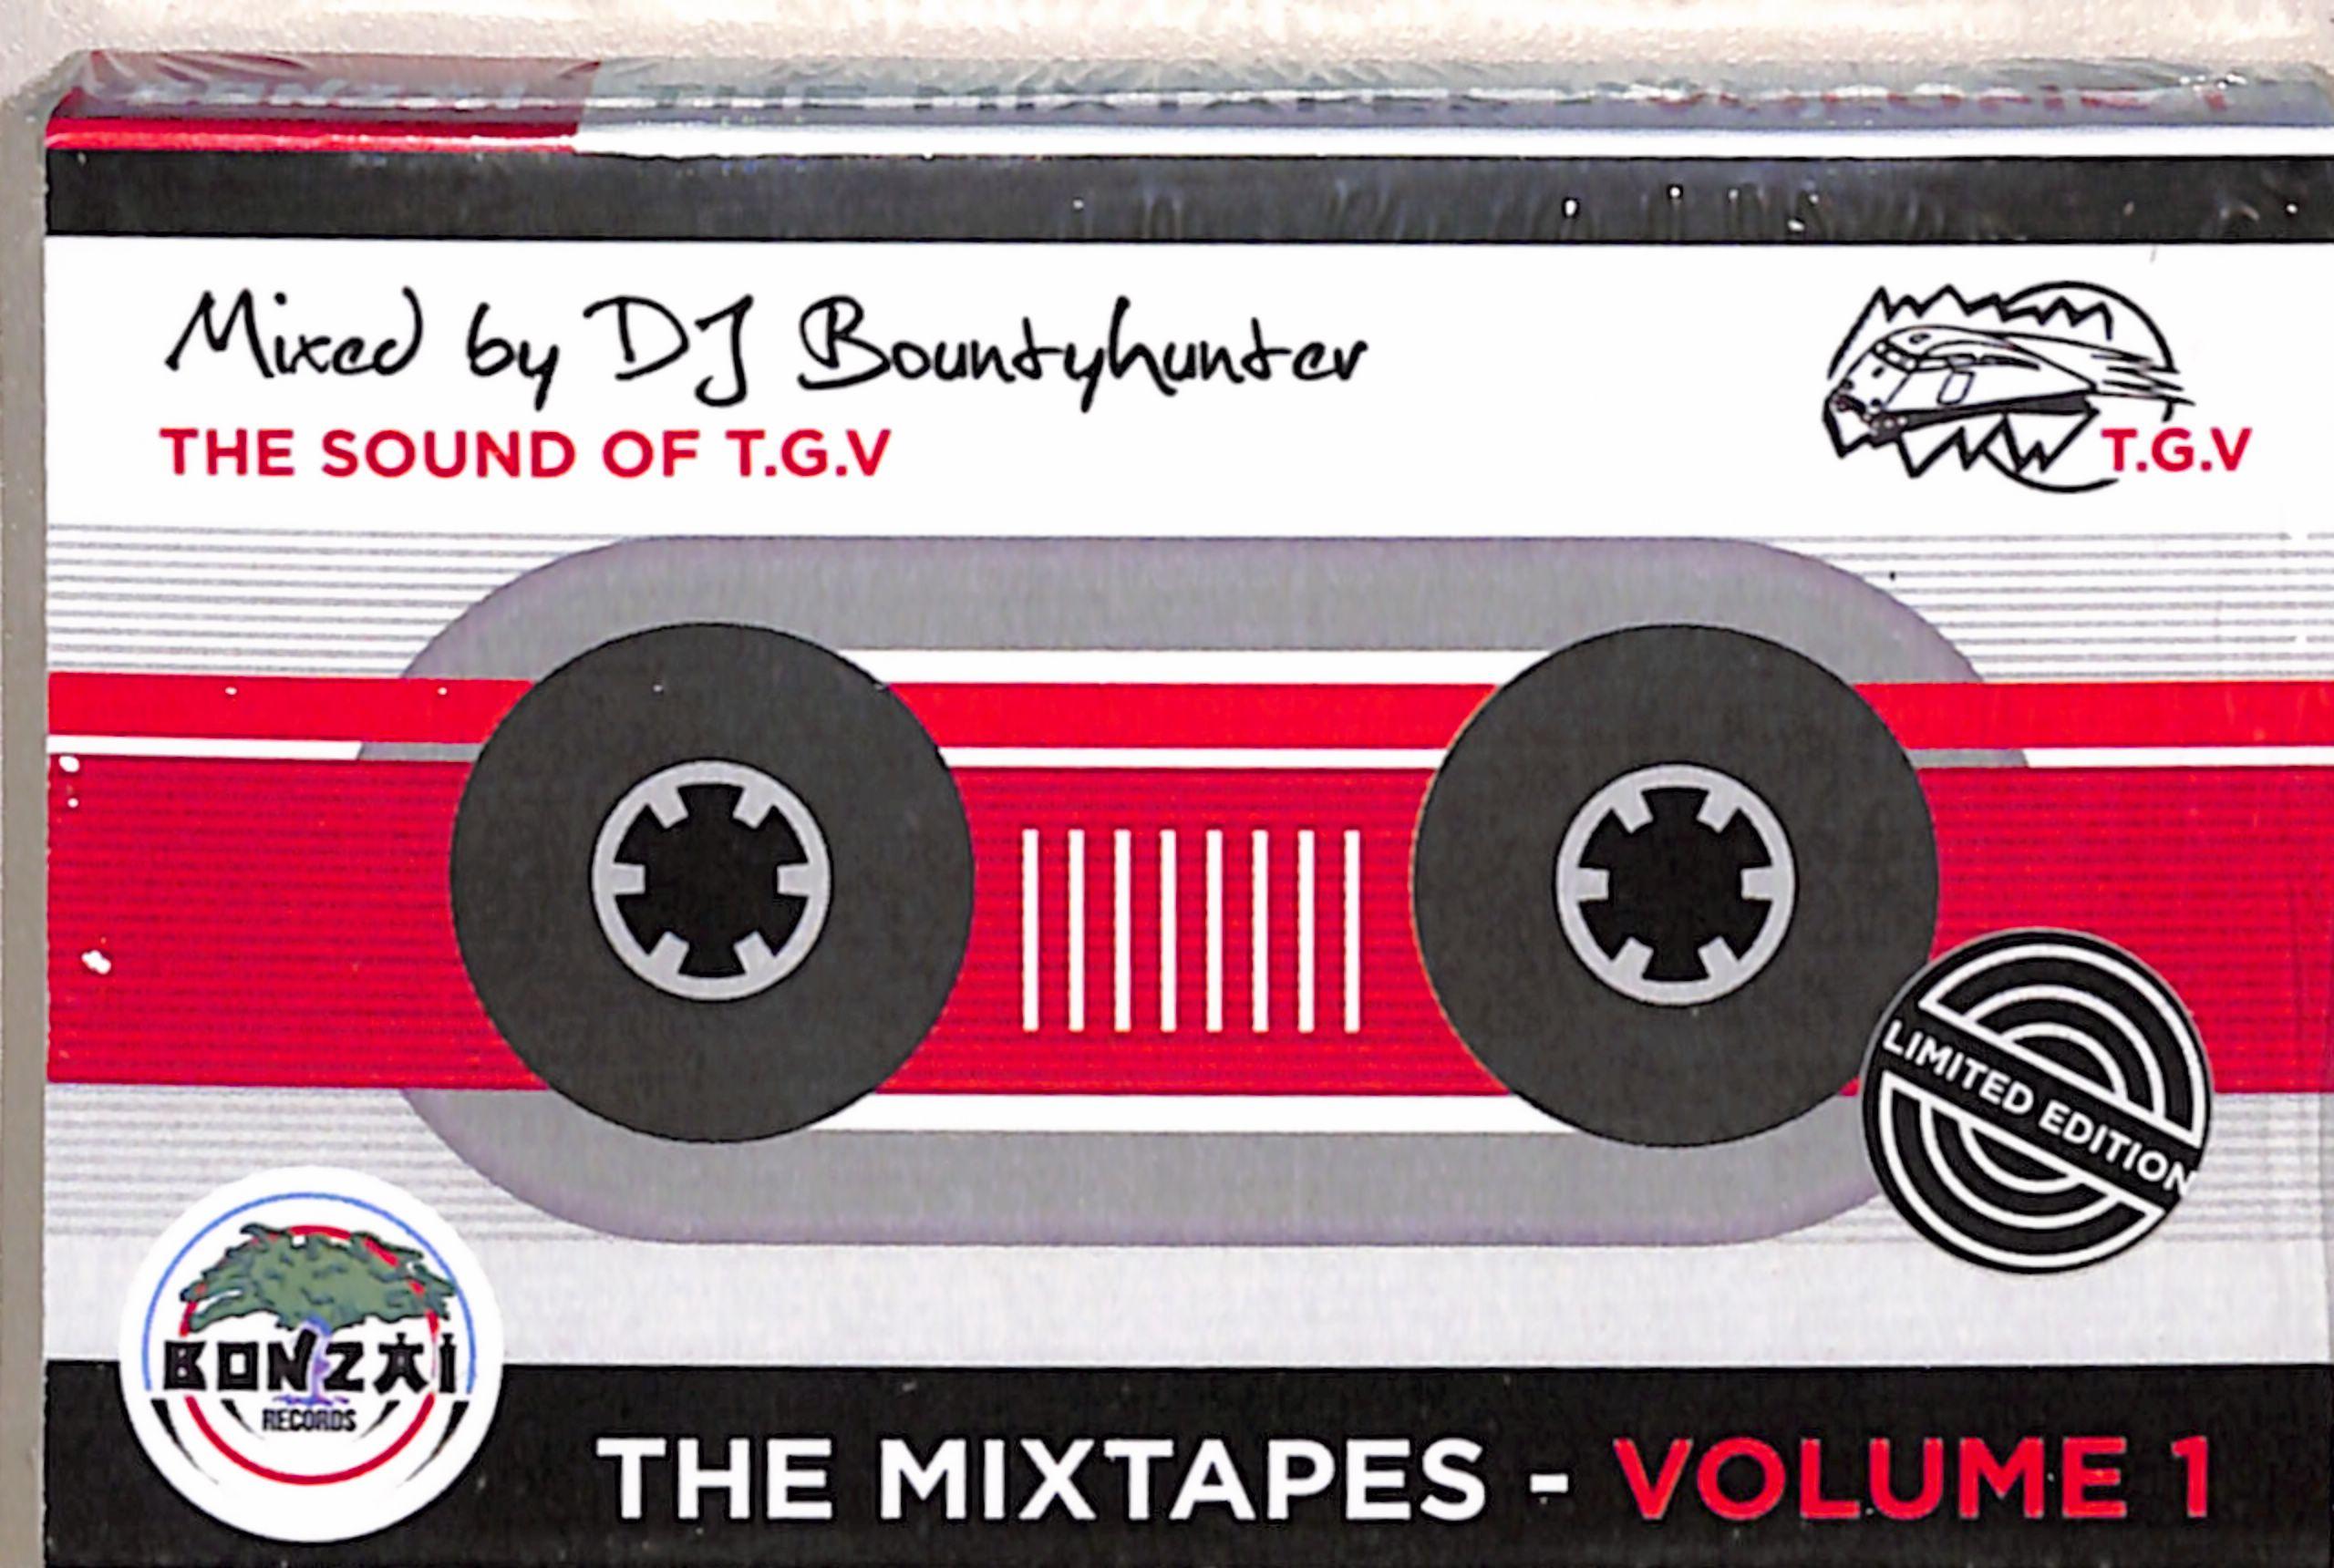 Various Artists / Bonzai Records - THE MIXTAPES: VOLUME 1